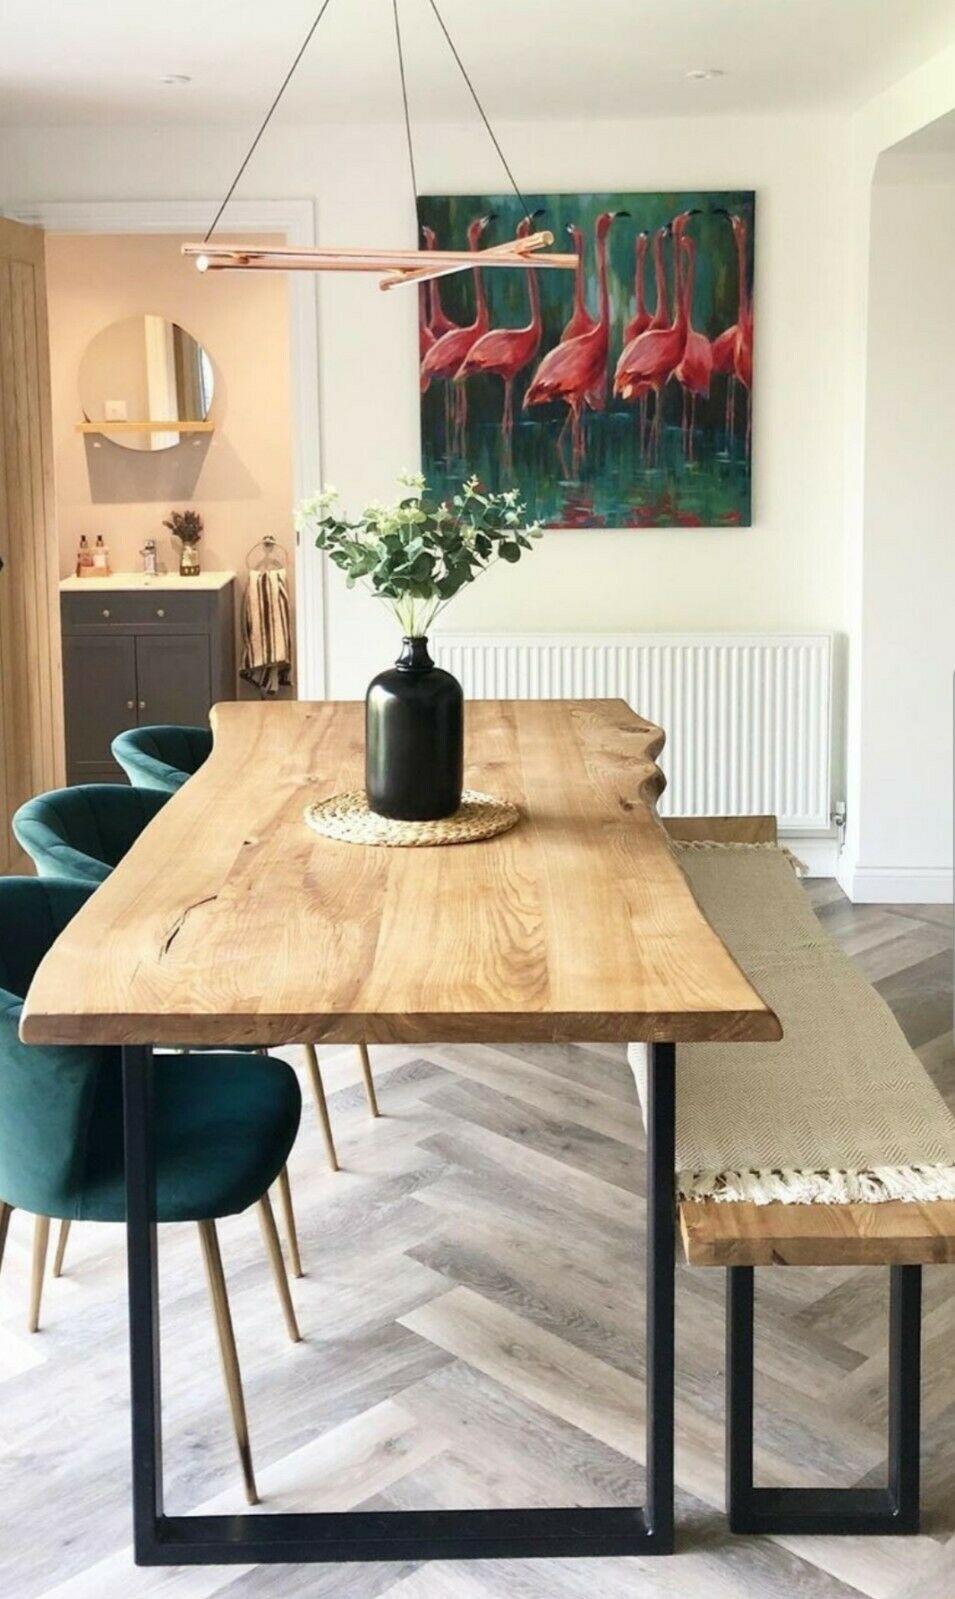 Solid oak ash dining table live edge Rustic Industrial metal legs